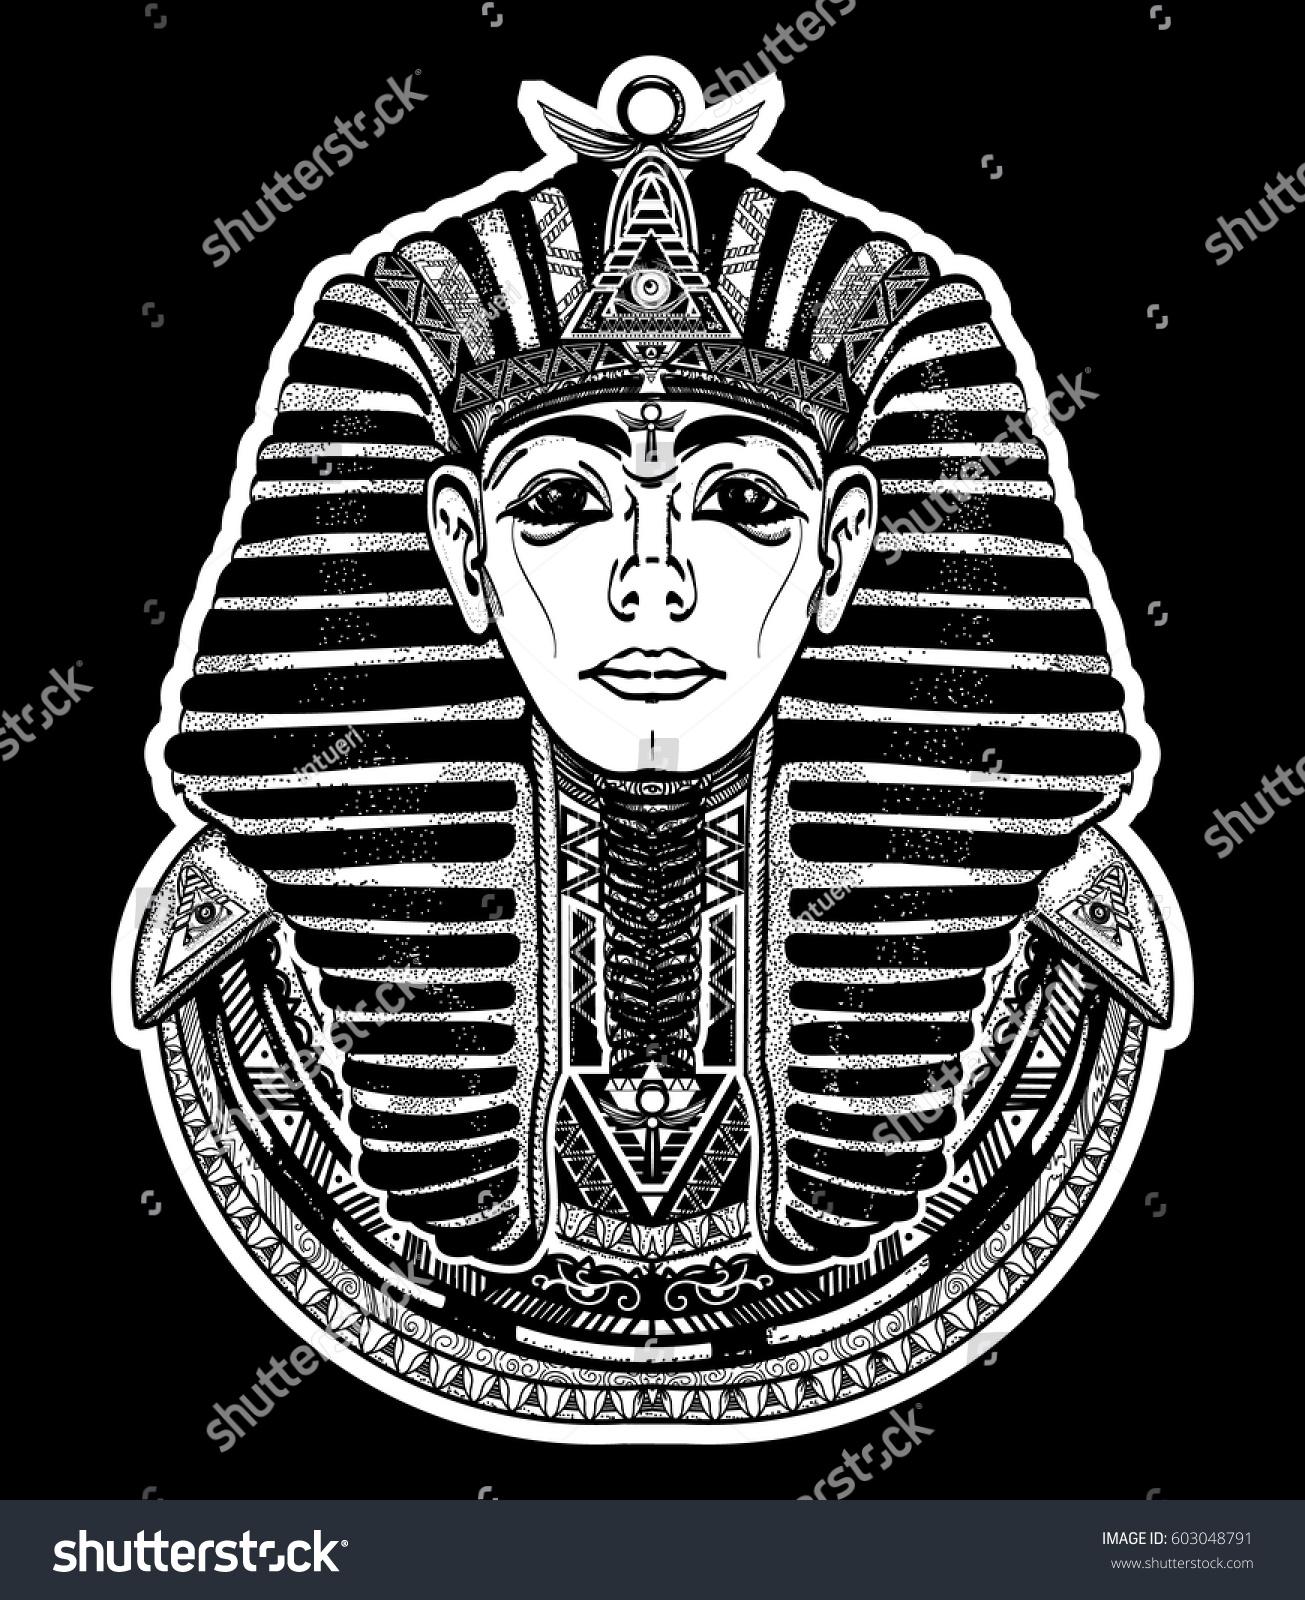 da8d3ace7 Pharaoh tattoo art graphic, t-shirt design. Great king of ancient Egypt.  Tutankhamen mask